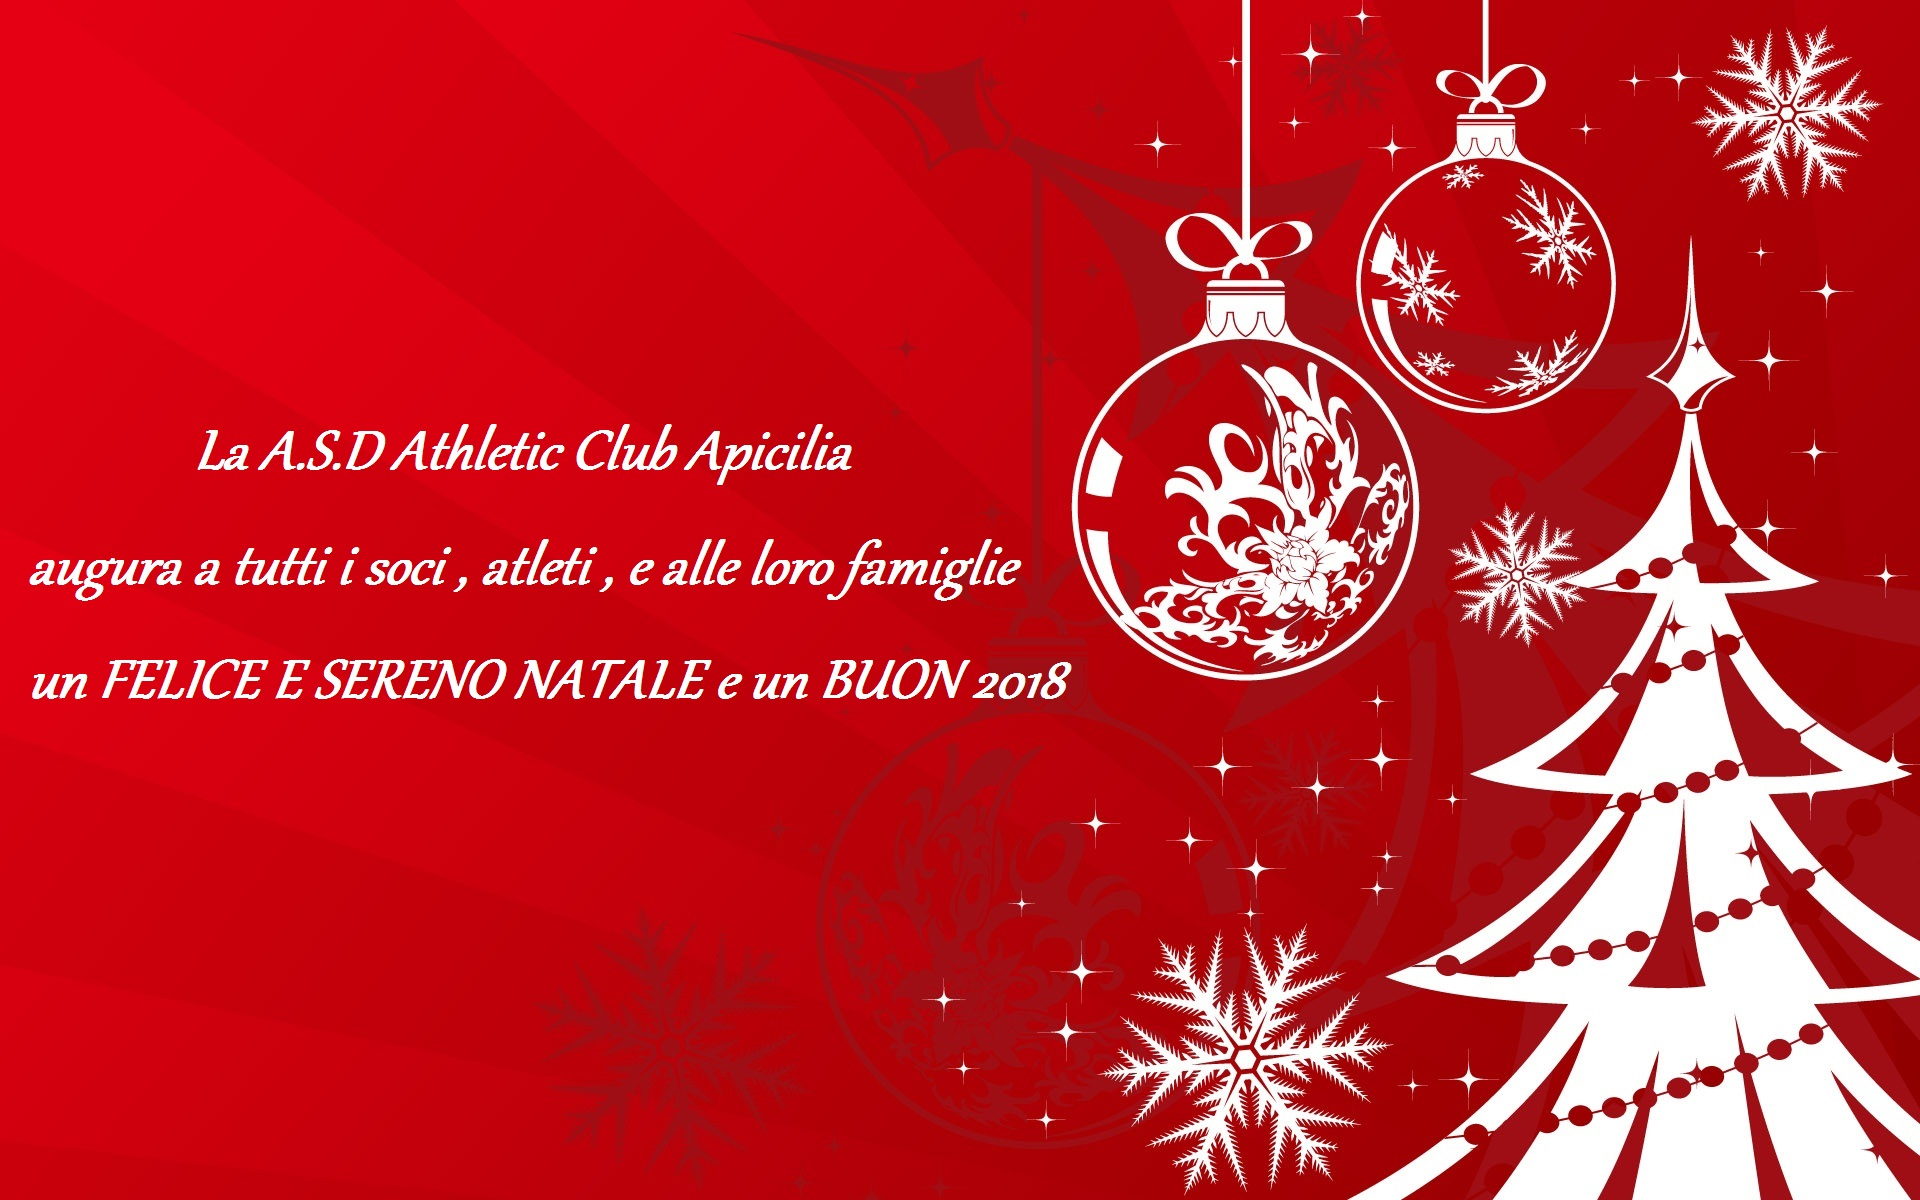 Auguri Di Buone Feste Natalizie Immagini.Tanti Auguri Di Buone Feste A S D Athletic Club Apicilia